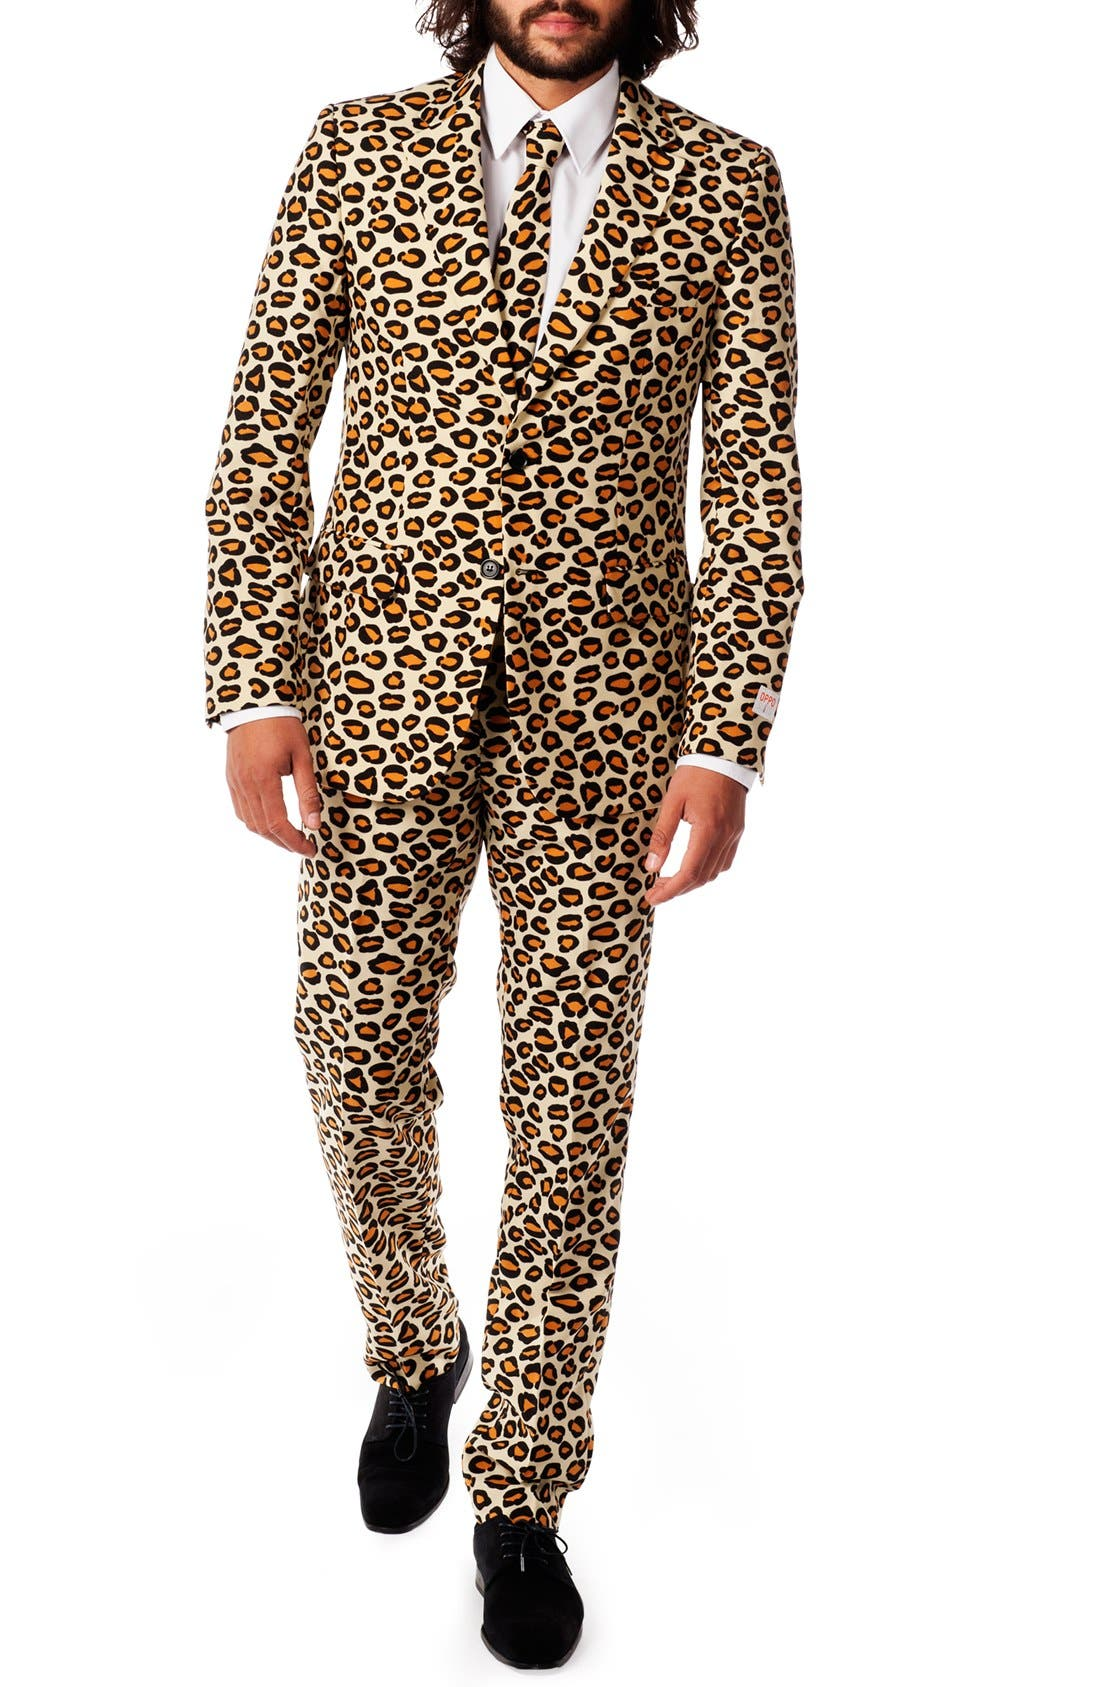 'The Jag' Trim Fit Two-Piece Suit with Tie,                         Main,                         color, Dark Beige